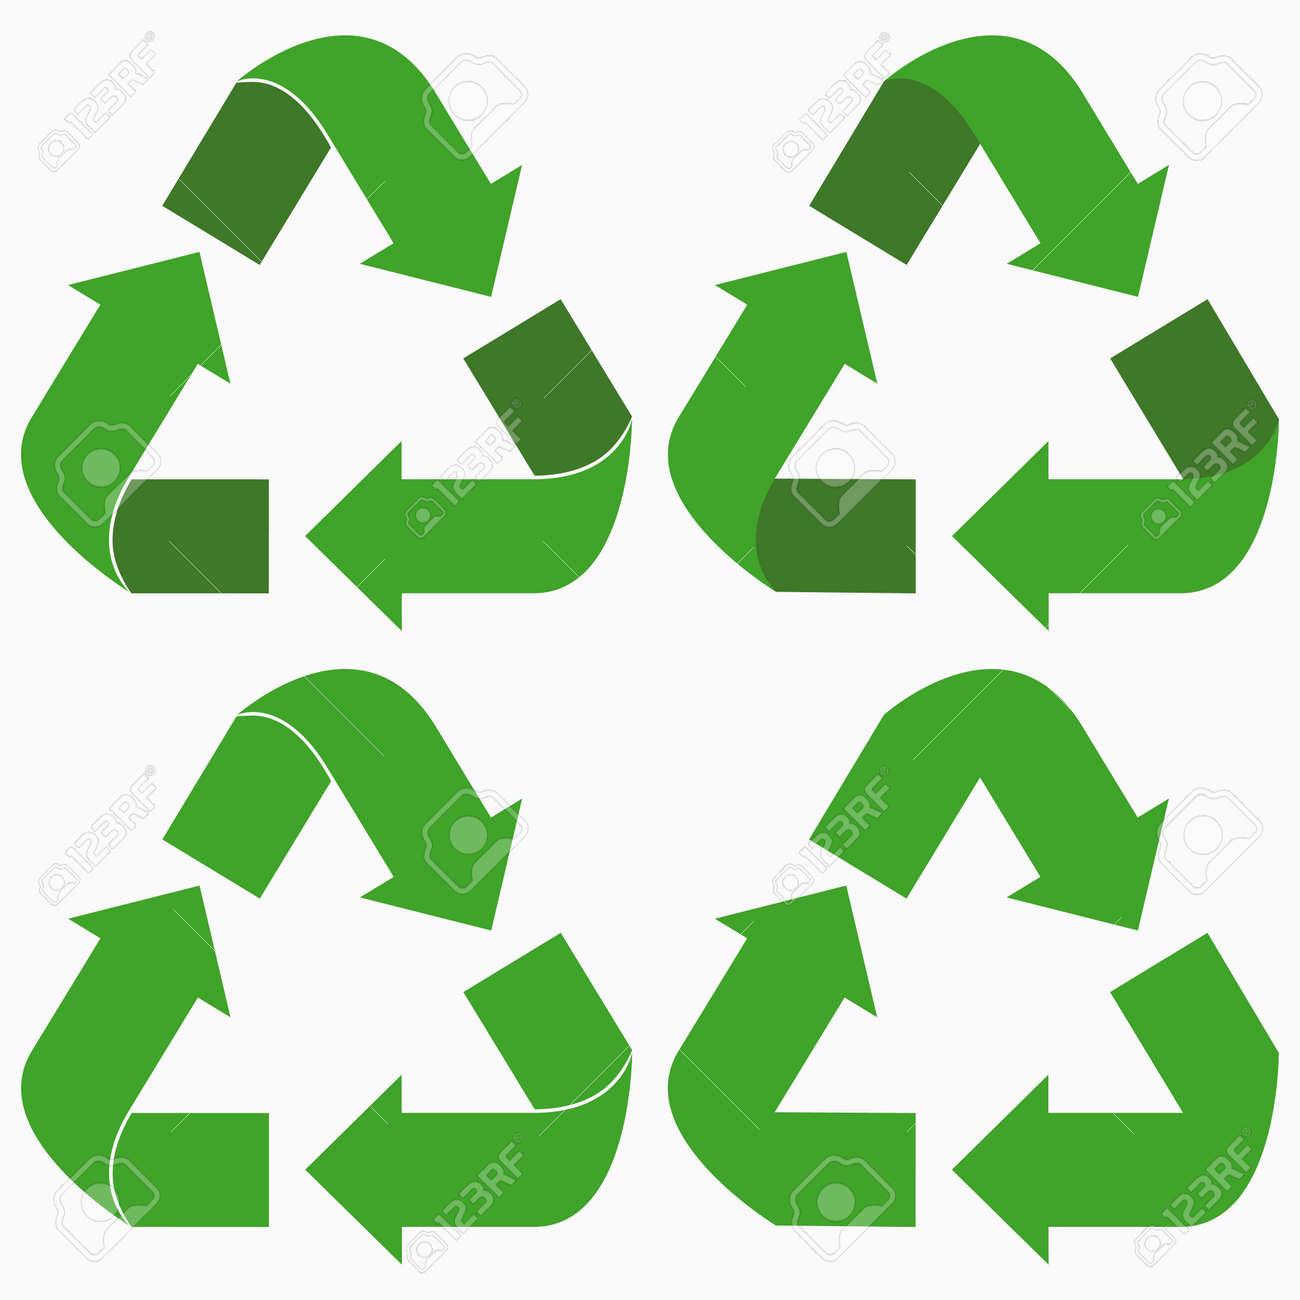 Green recycle arrows set. Vector illustration. - 126781514